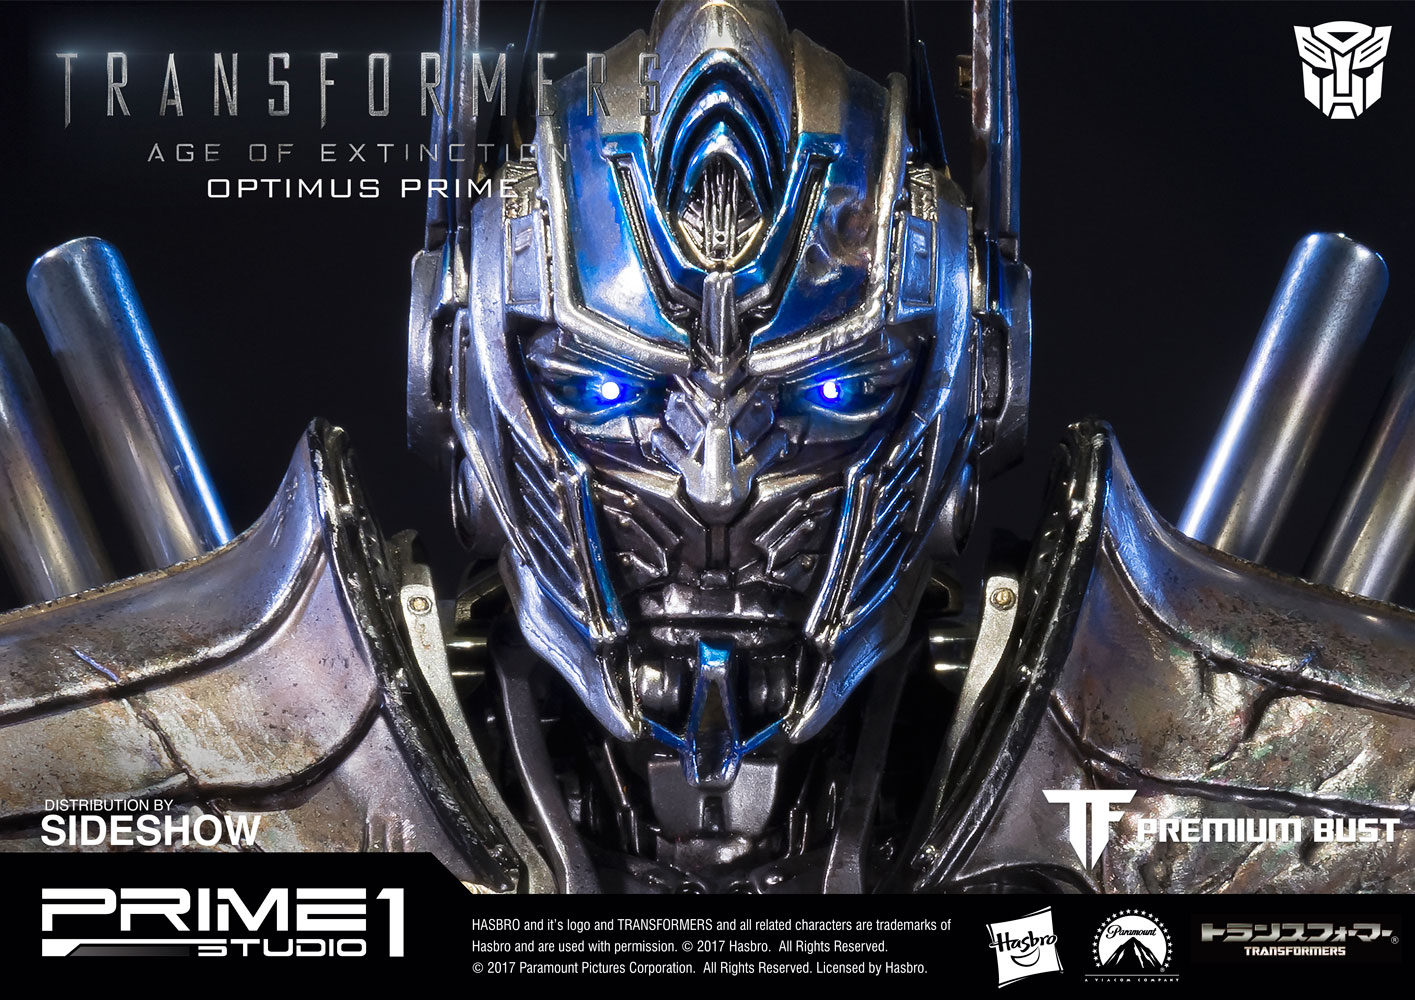 transformers optimus prime damaged version bustprime 1 s